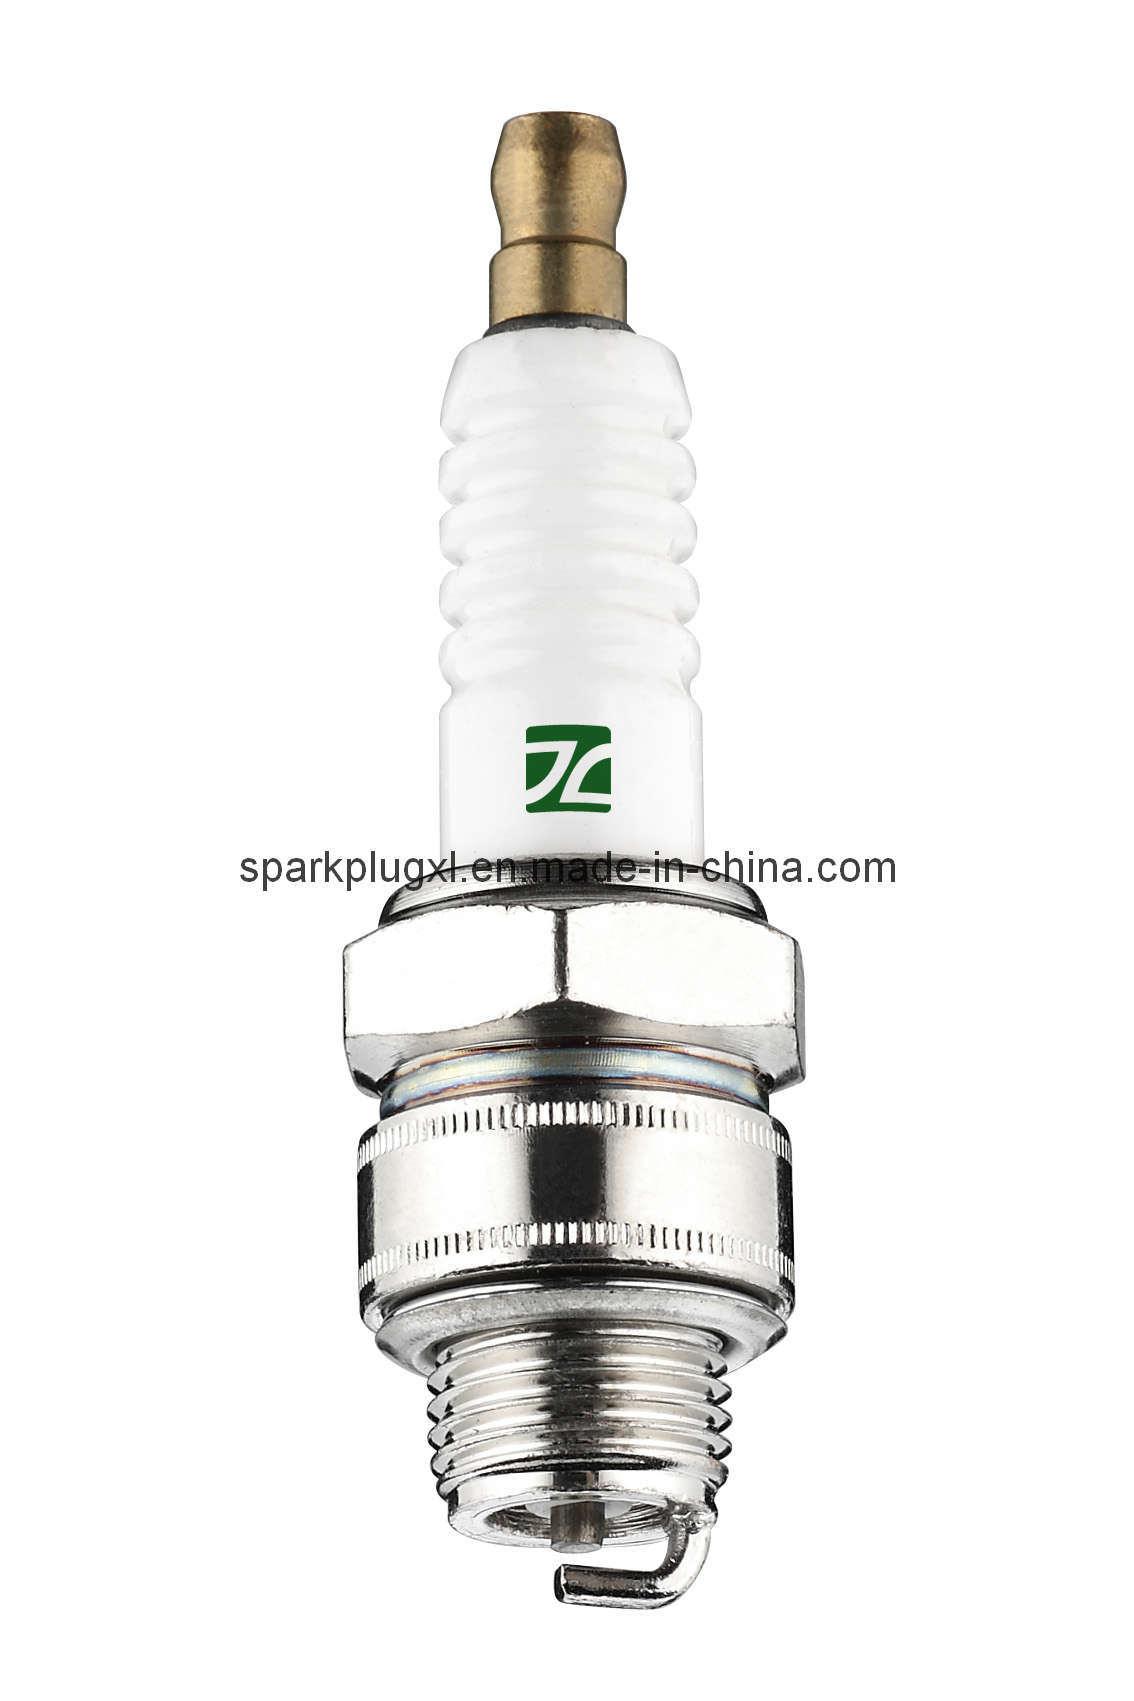 Small Engine Spark Plugs (G6 B6S J8C W8EC)